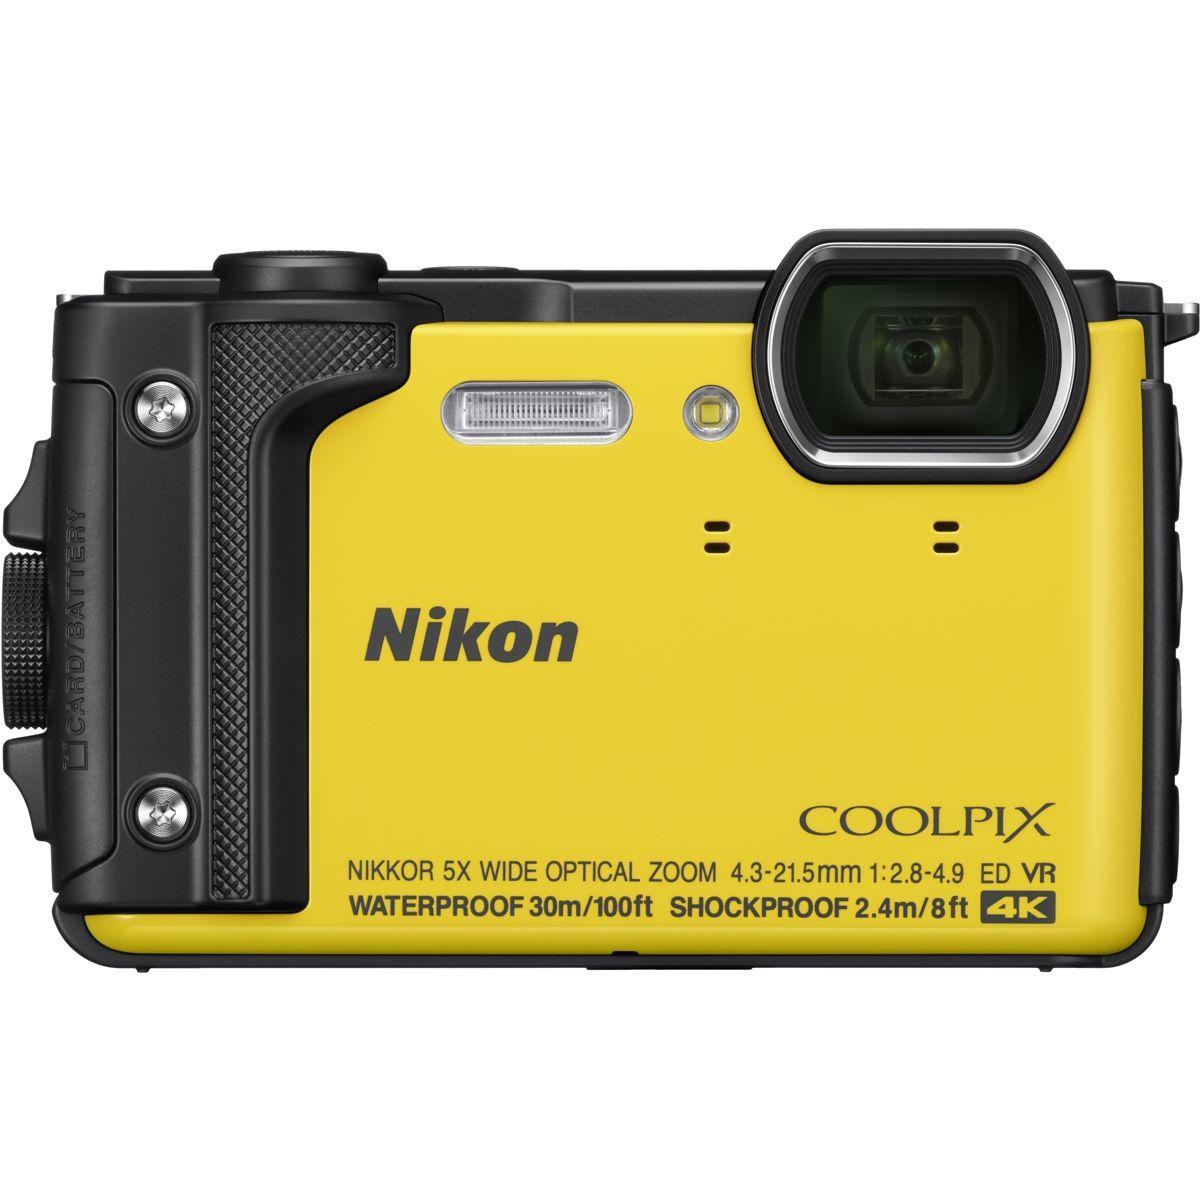 Appareil photo compact nikon coolpix w300 jaune + sac �tanche (photo)